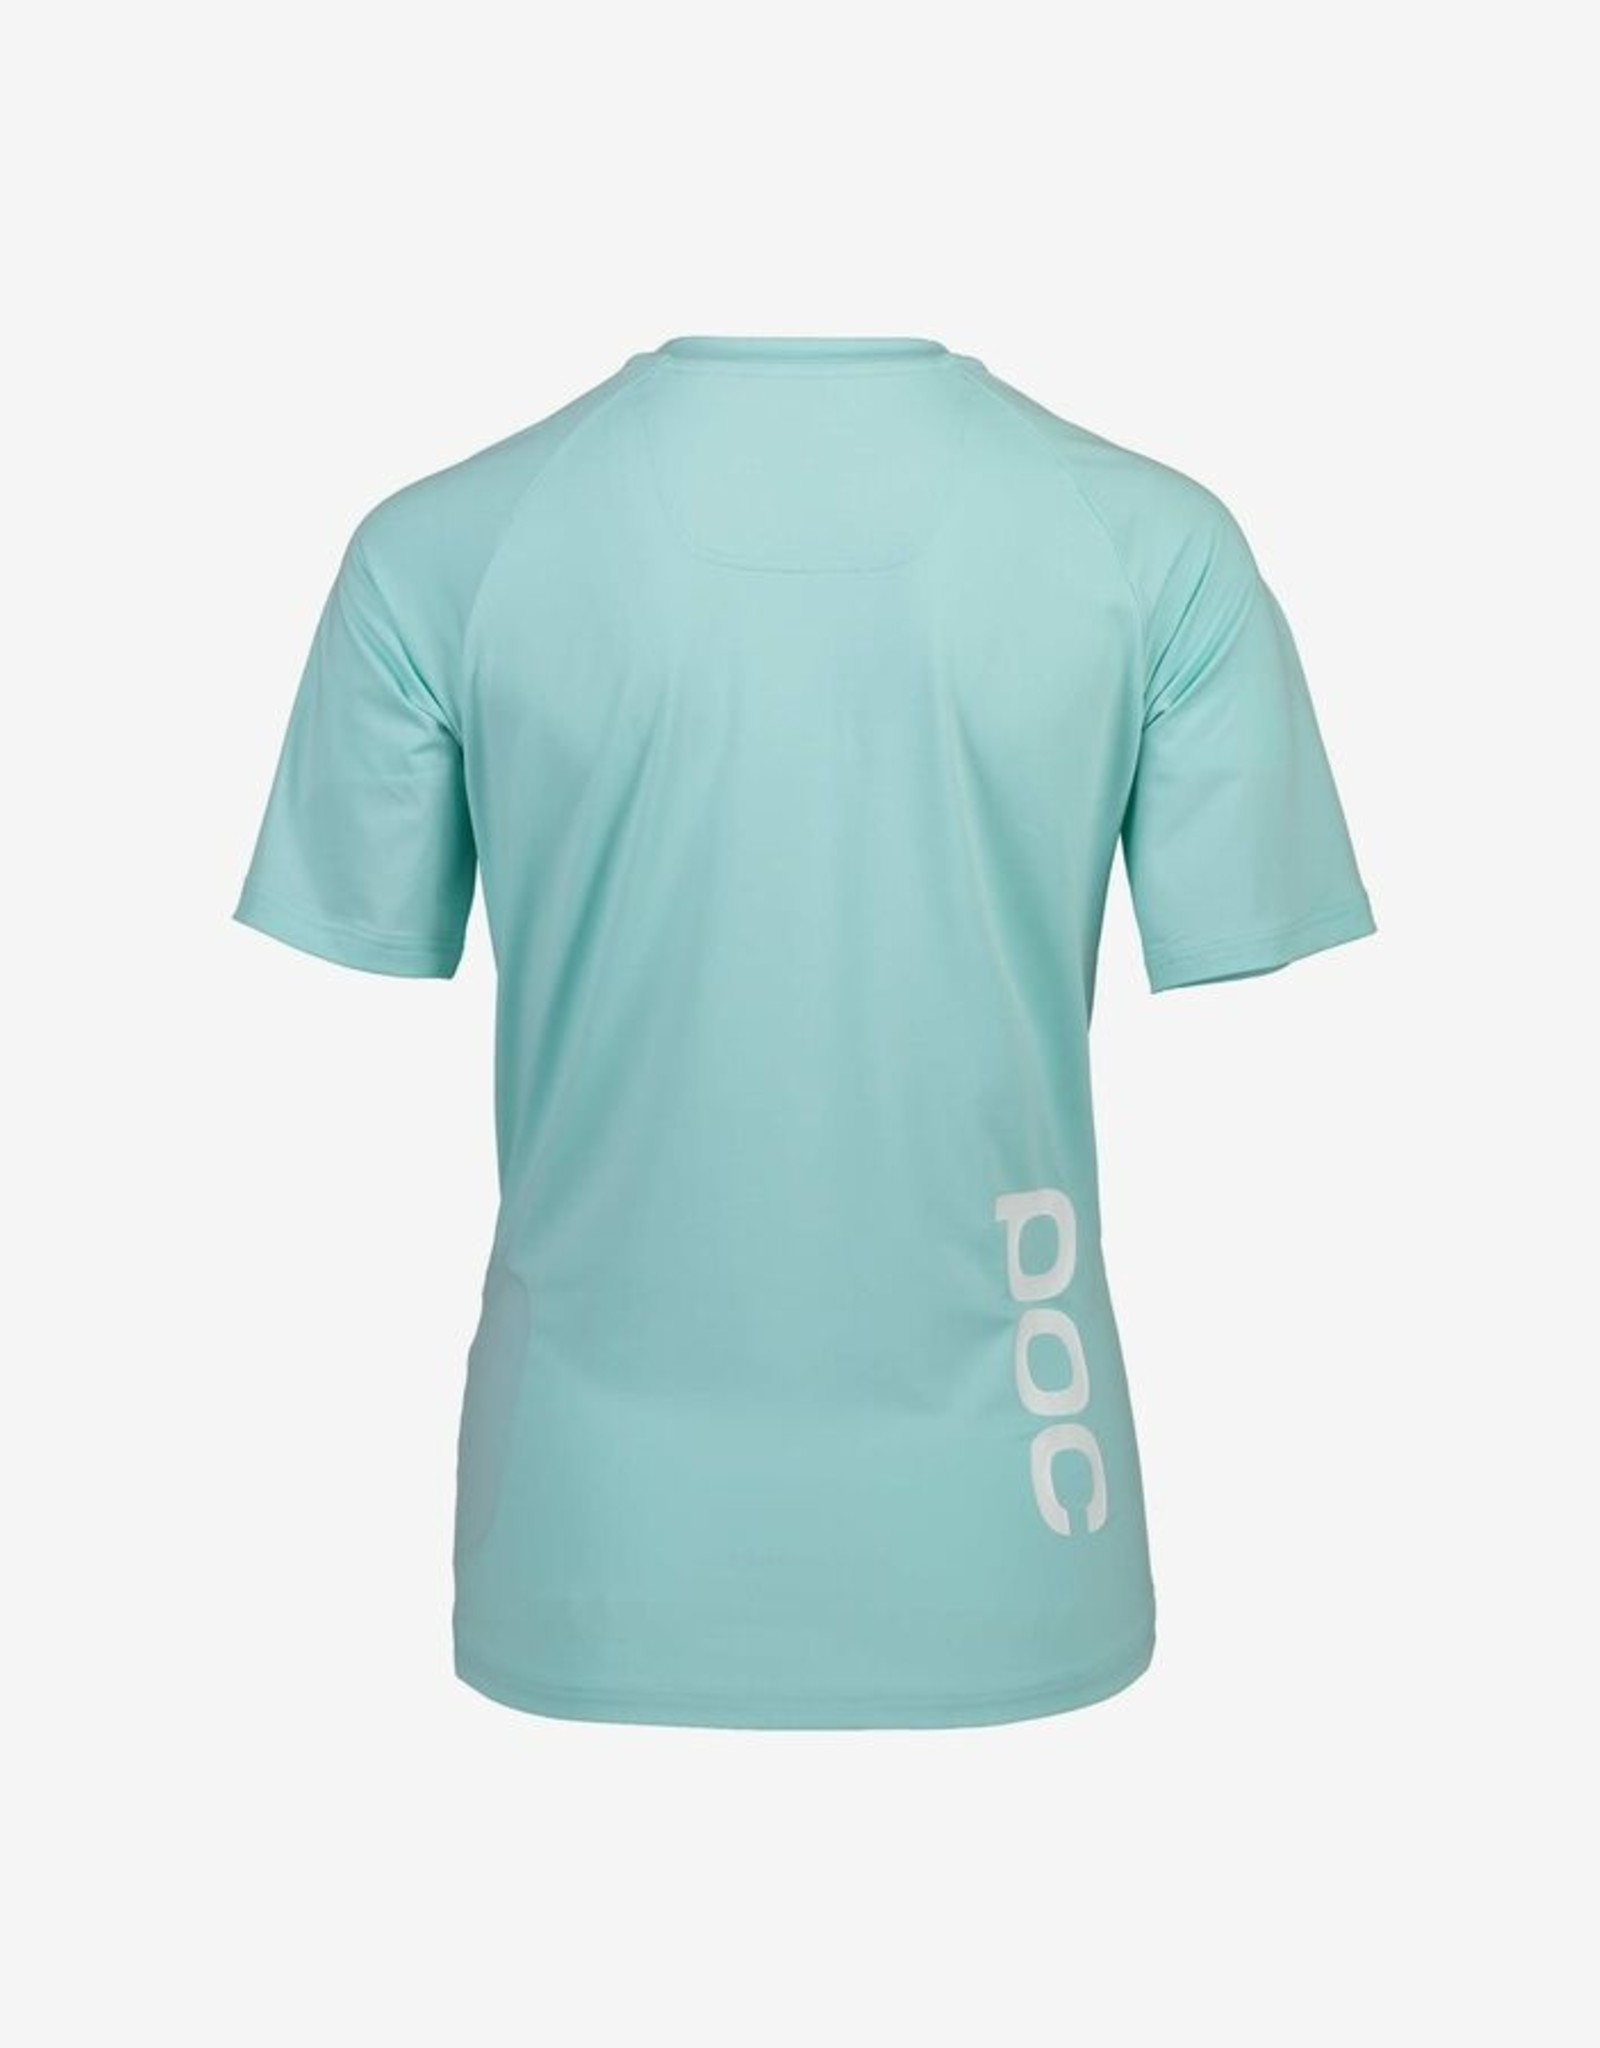 POC T-Shirt POC Essentiel MTB Femme